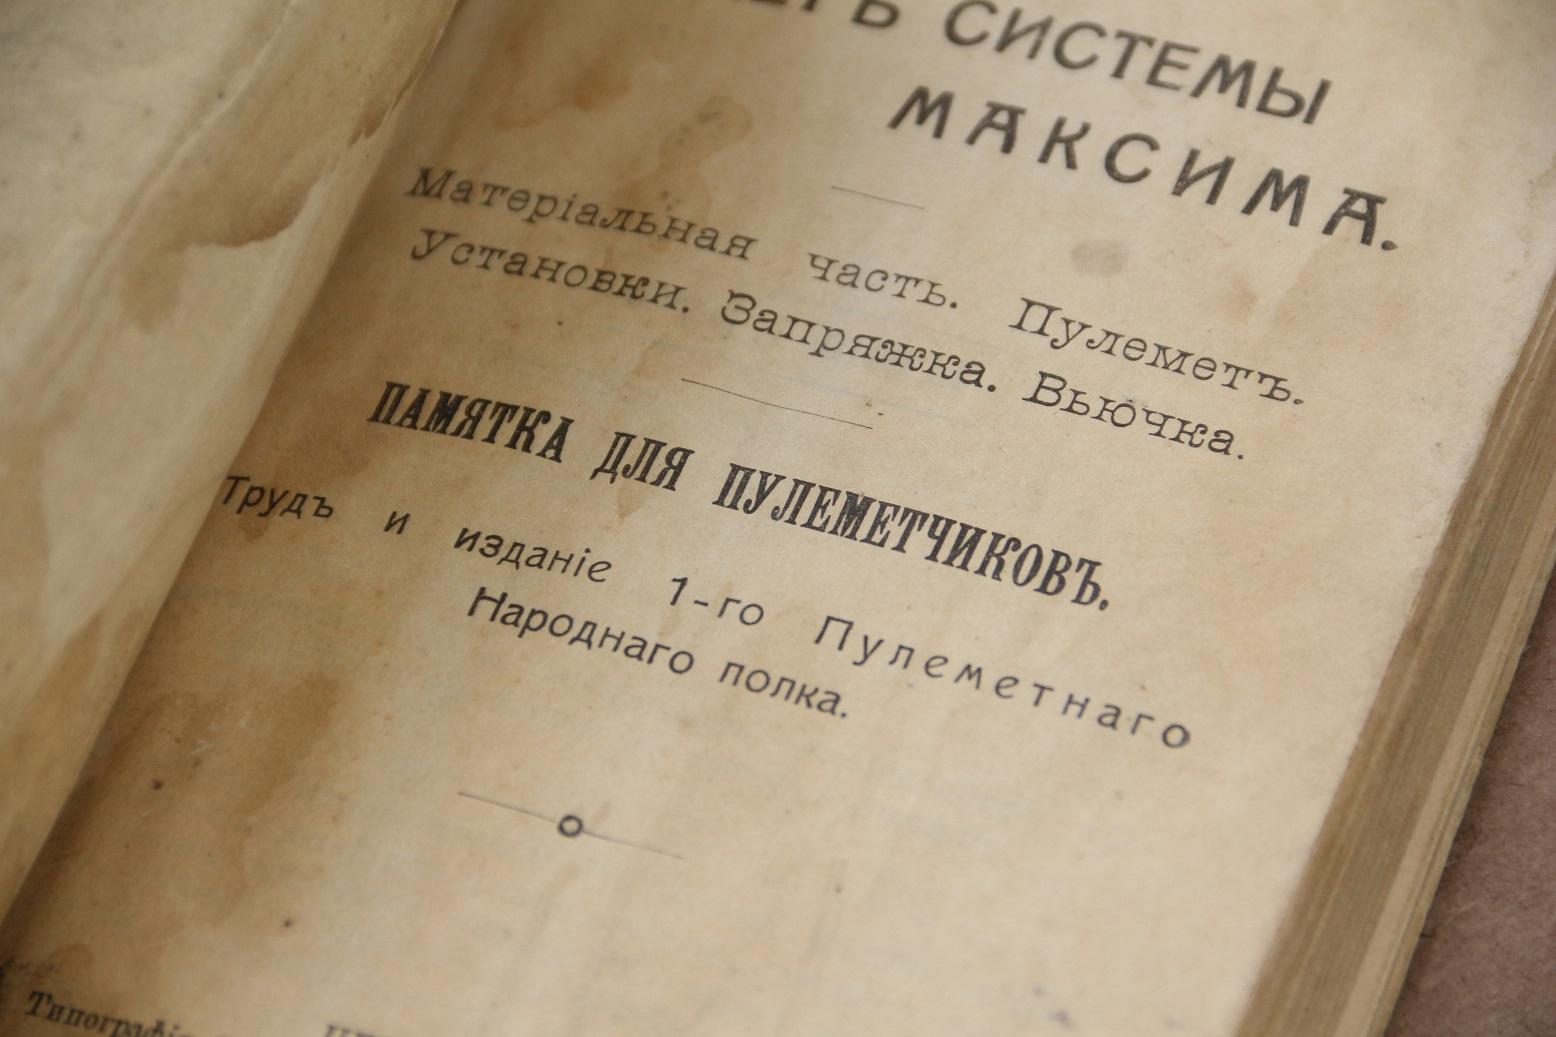 Фото Пулемет системы Максима, издание 1-ого Пулеметного Народного Полка, Петроград, 1917 год